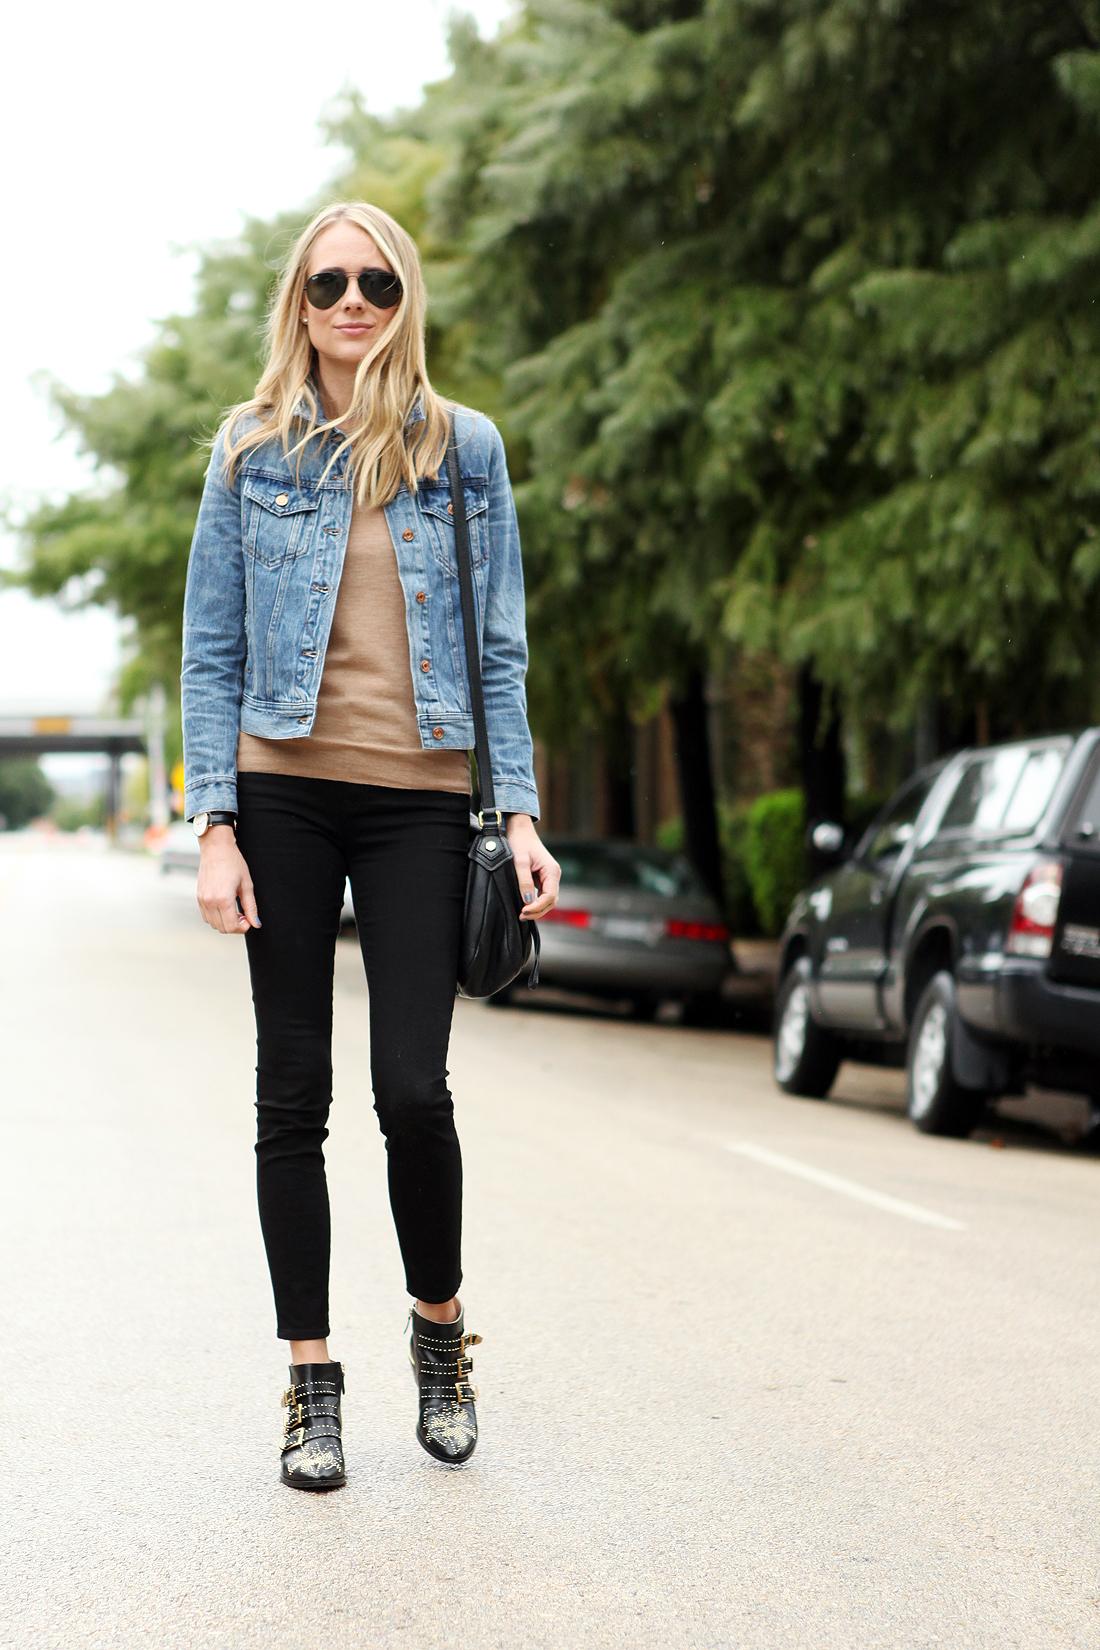 fashion-jackson-ray-ban-black-aviator-sunglasses-jcrew-denim-jacket-black-skinny-jeans-chloe-susanna-booties